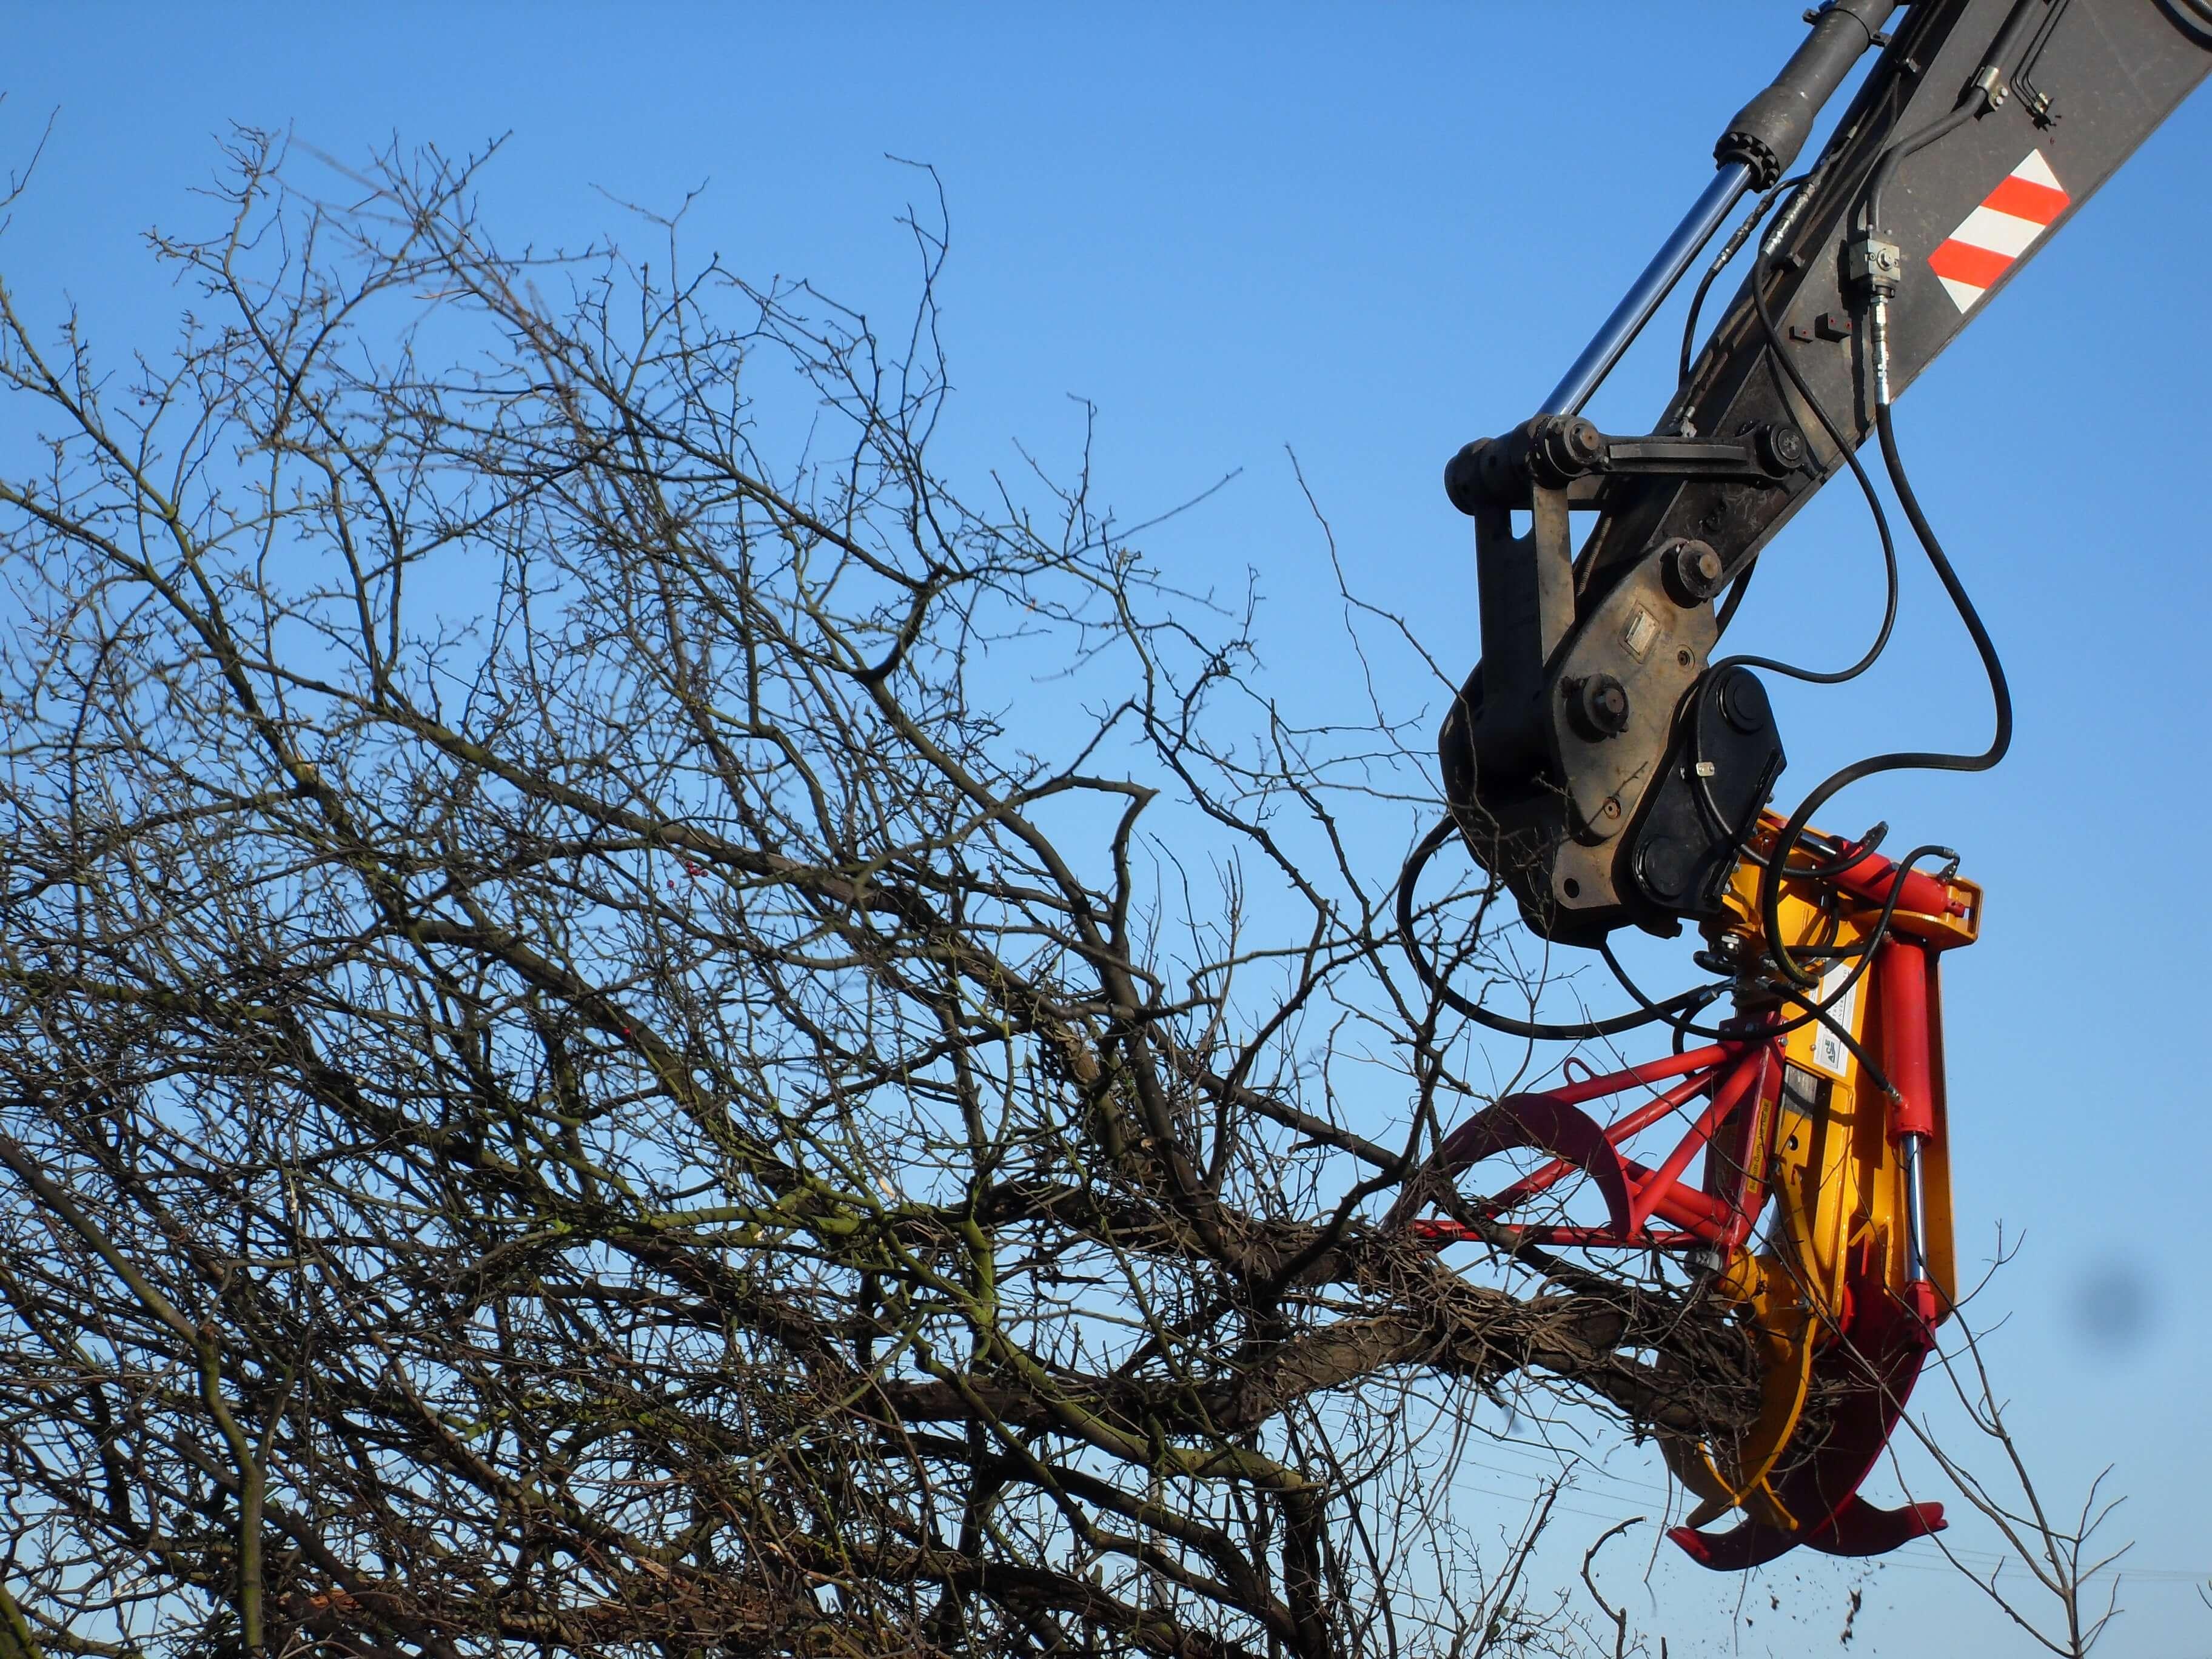 Treegrip Cutter